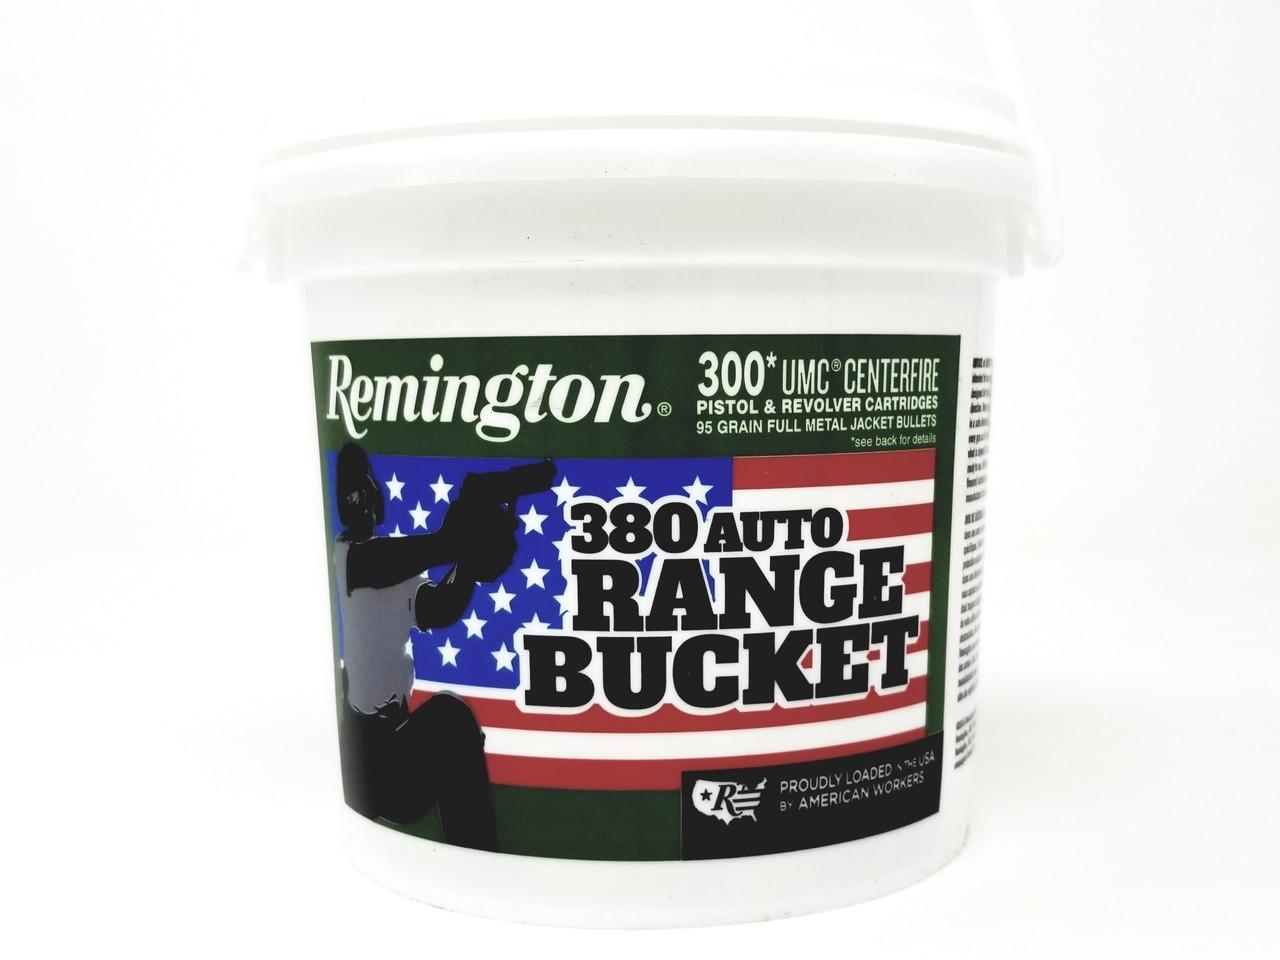 Remington Rebate Access >> Remington 380 Acp Ammunition Umc Range Bucket L380apbca 95 Grain Full Metal Jacket Case Of 1200 Rounds